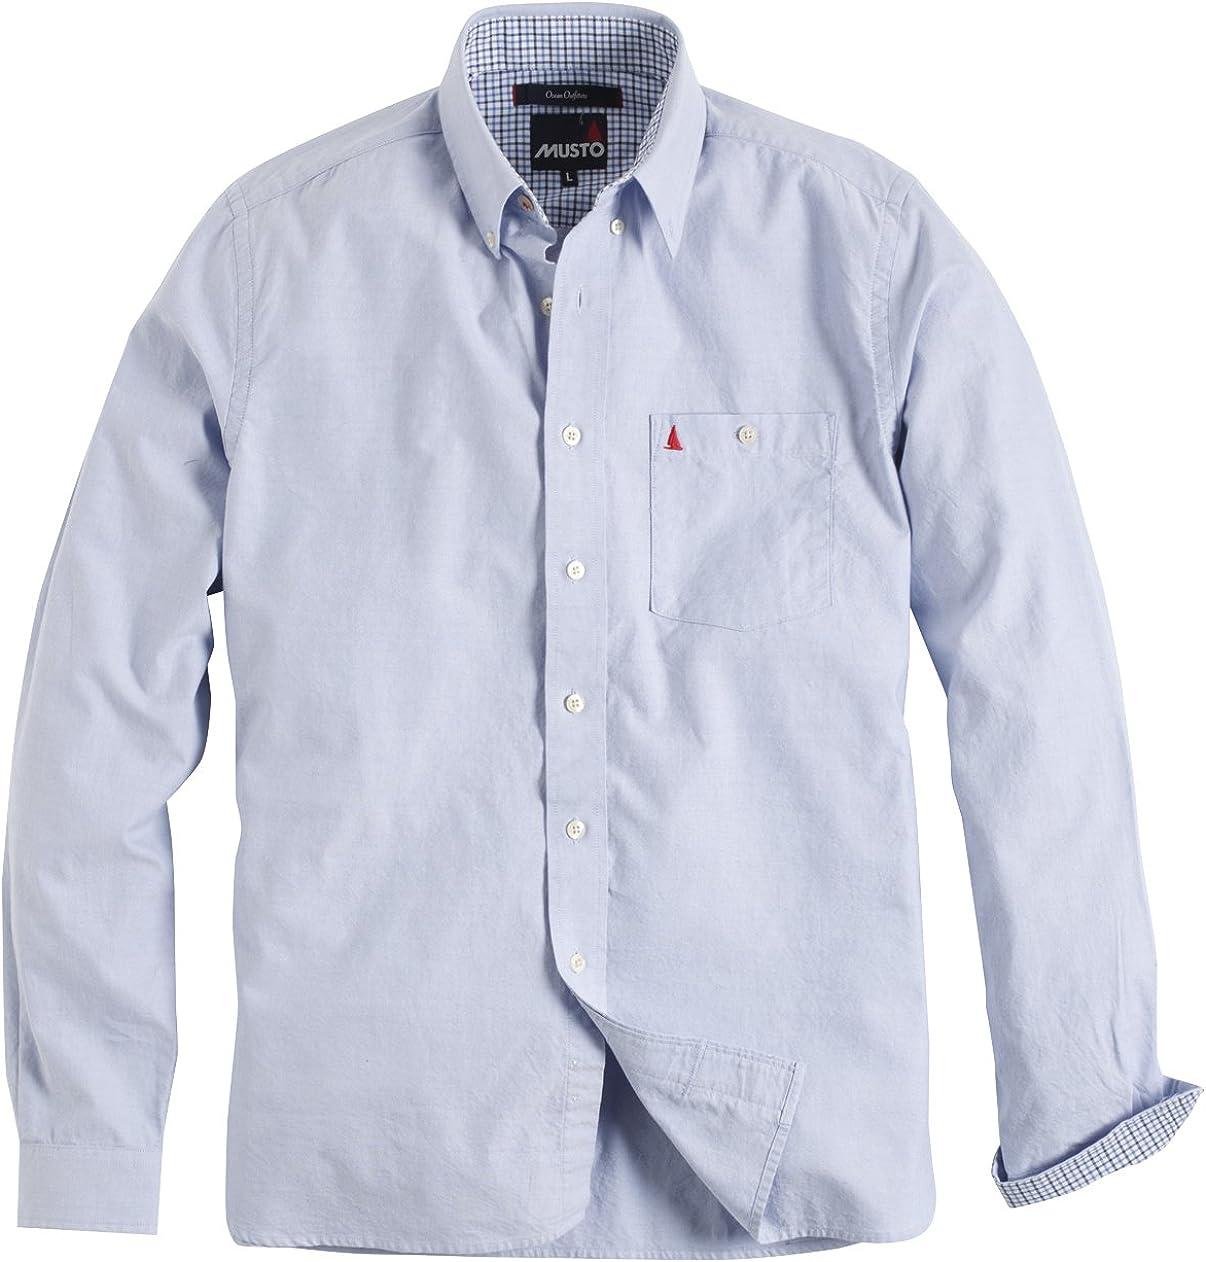 Musto - Camisa Clásico manga larga Modelo Oxford hombre caballero - Trabajo/Fiesta/Boda (Extra Grande (XL)/Azul): Amazon.es: Ropa y accesorios